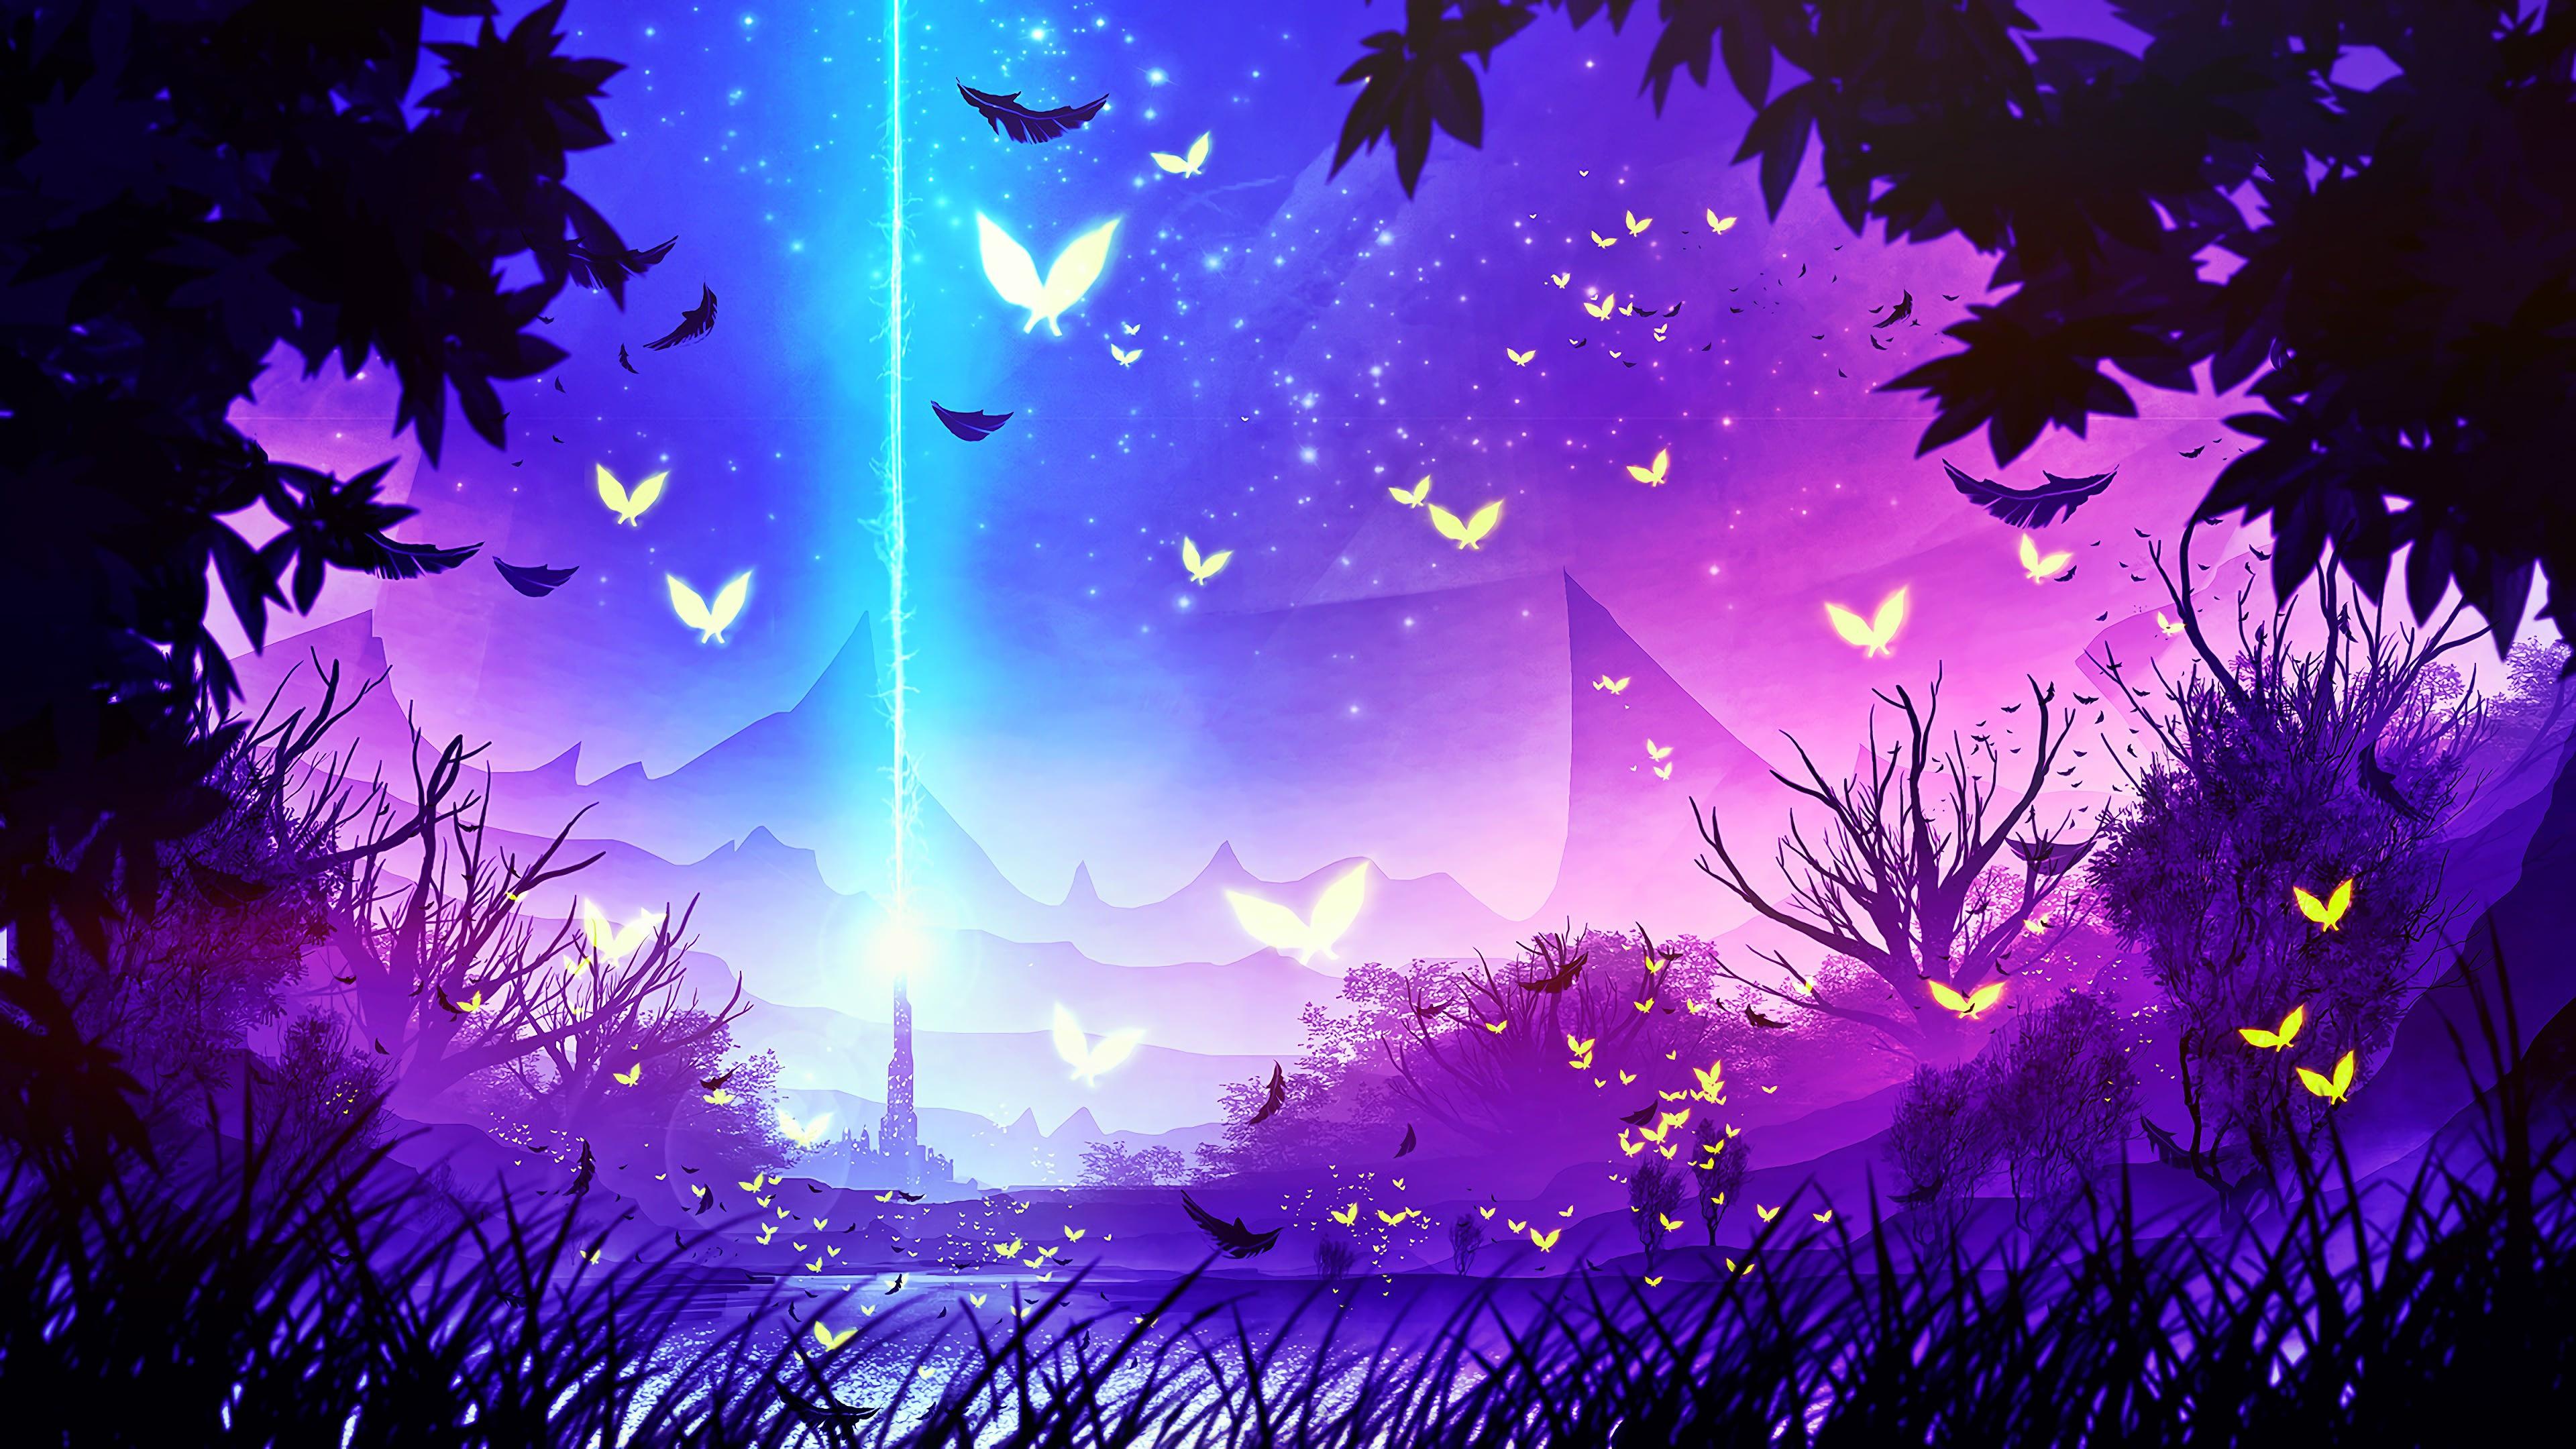 Landscape Forest Fantasy Art 4k Hd Artist 4k Wallpapers